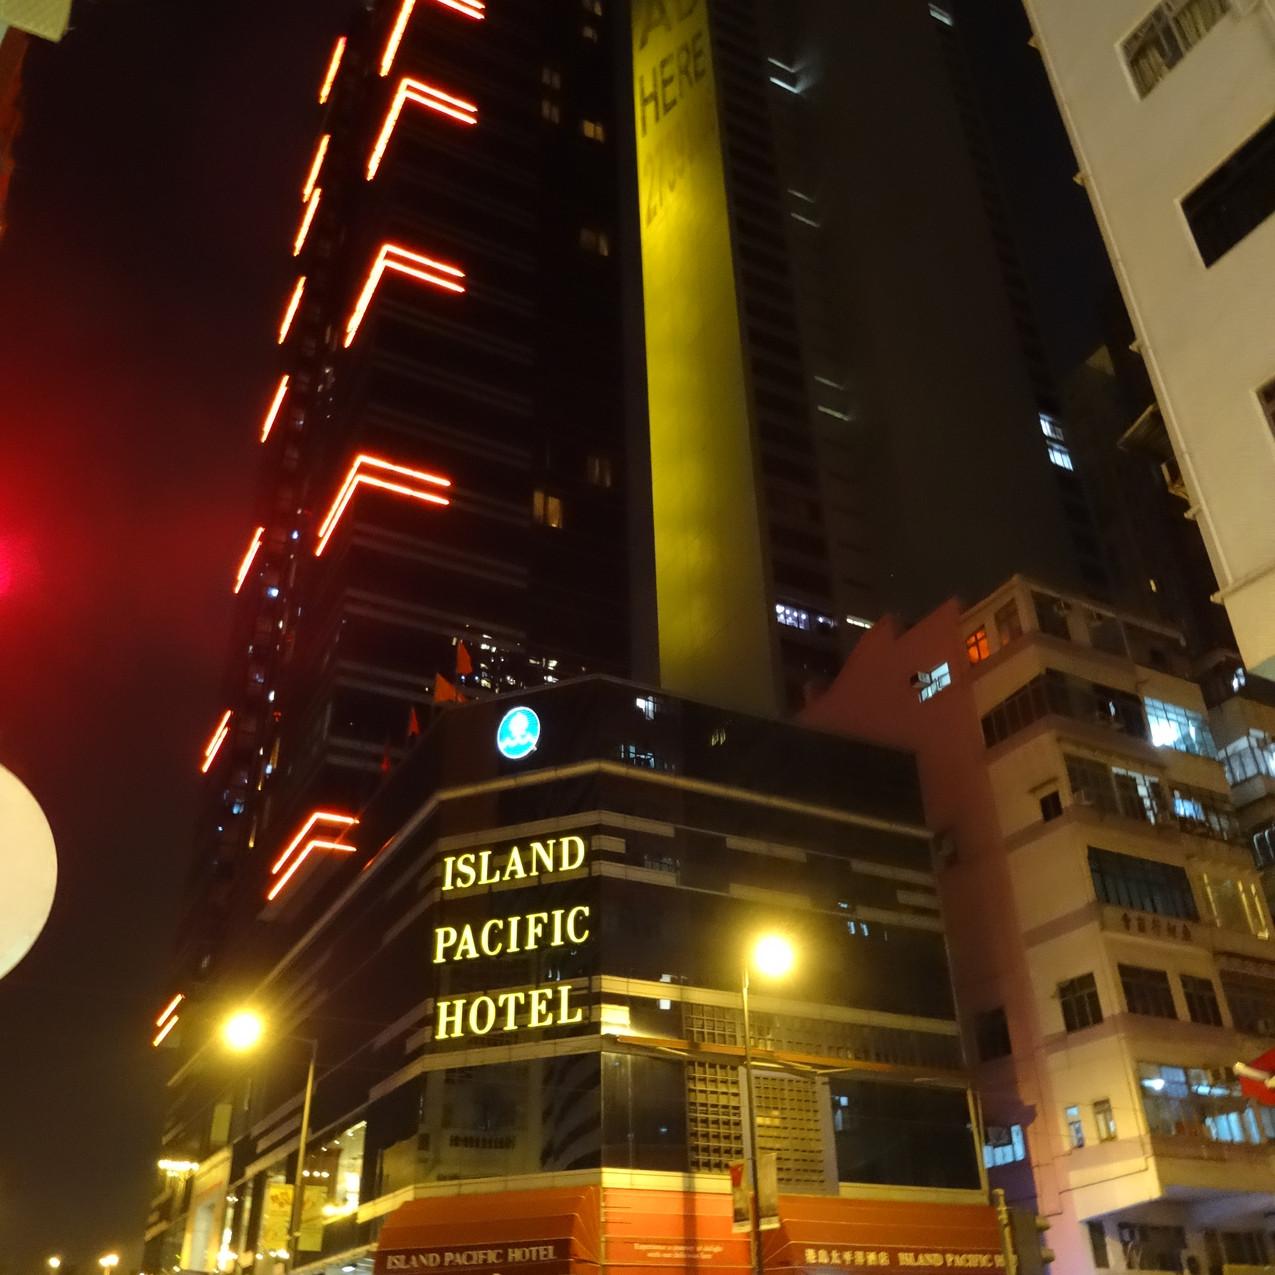 Our hotel Hong Kong